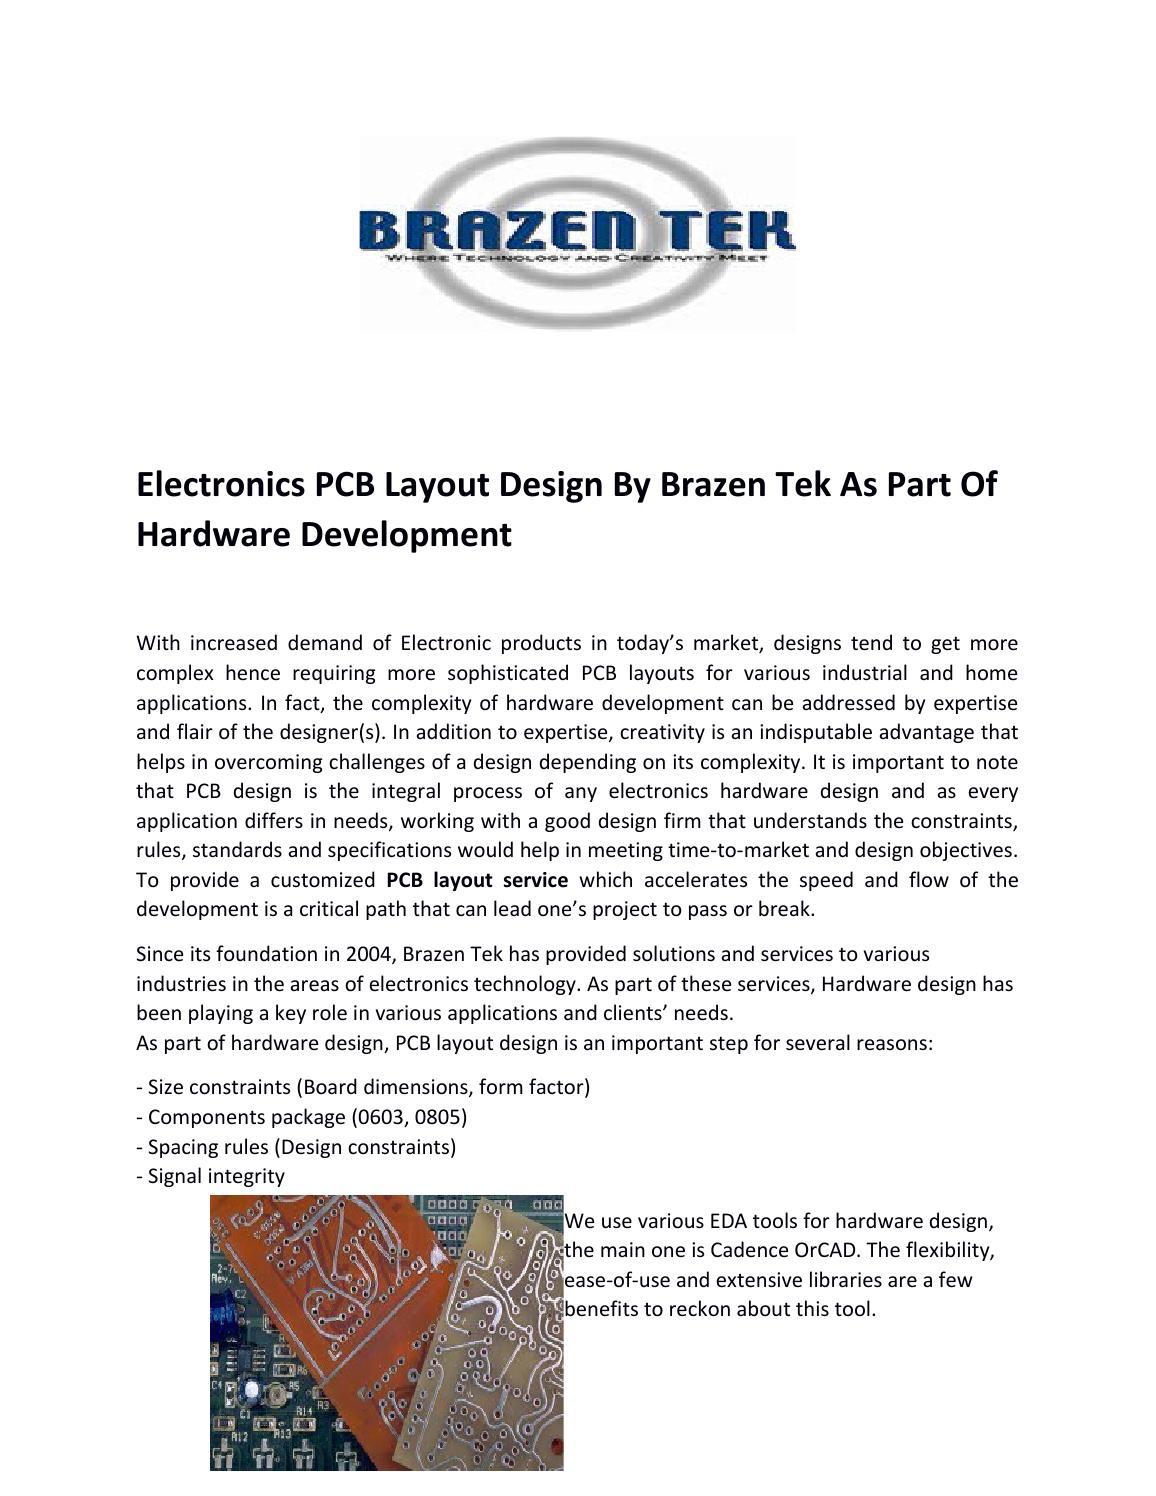 Electronics PCB Layout Design By Brazen Tek As Part Of